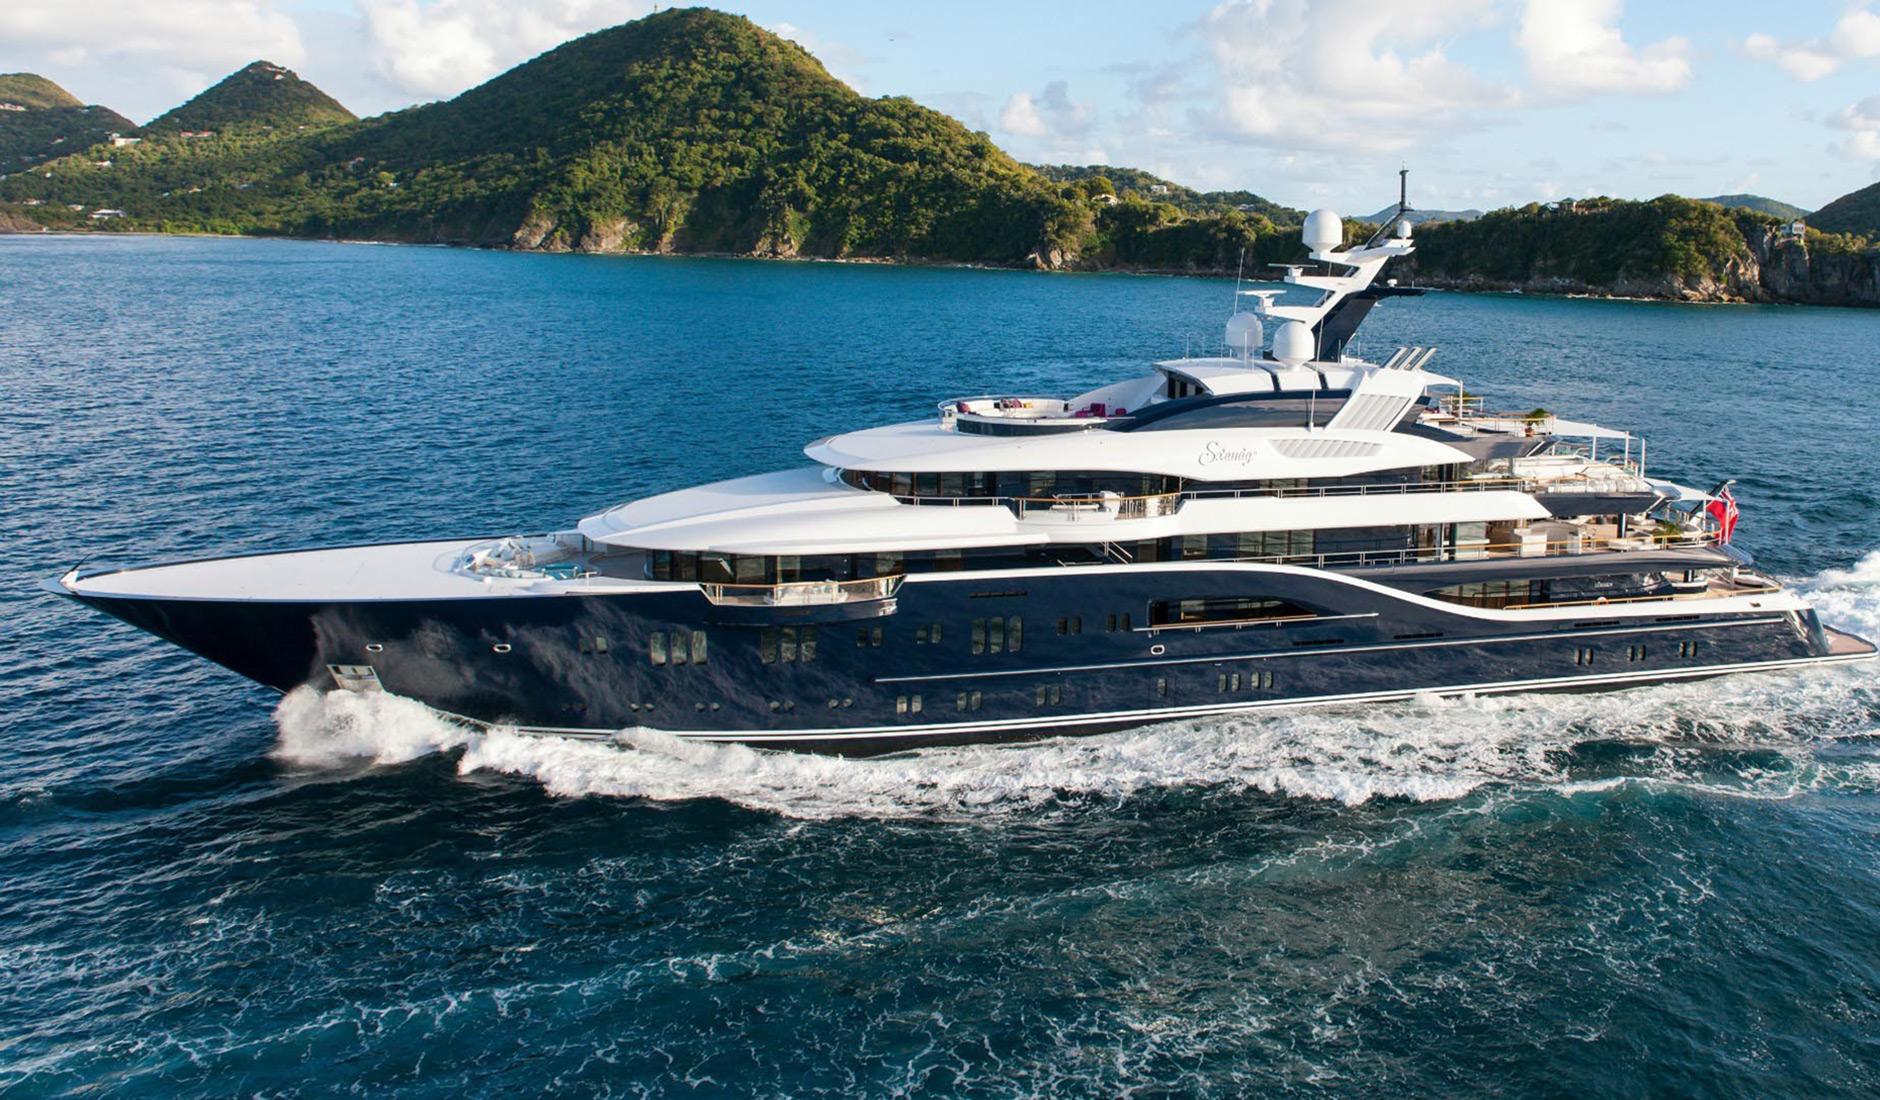 Lurssen Motor Yacht SOLANDGE